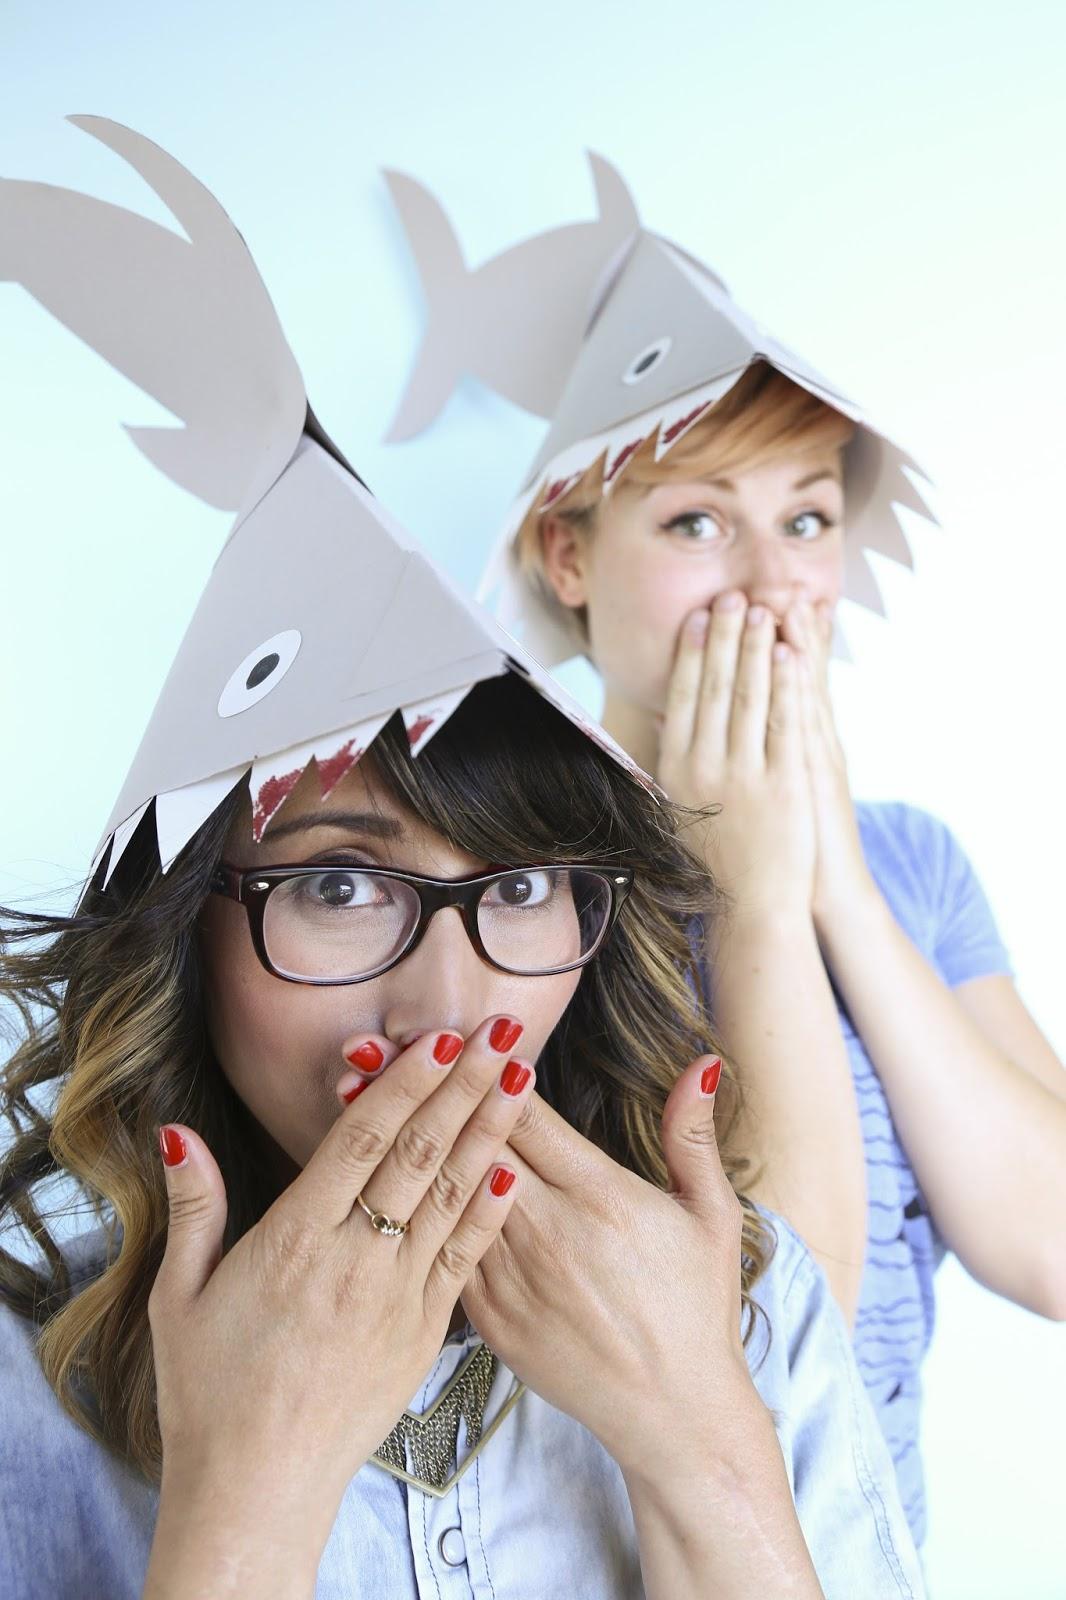 Fun DIY Shark hat by Modcloth